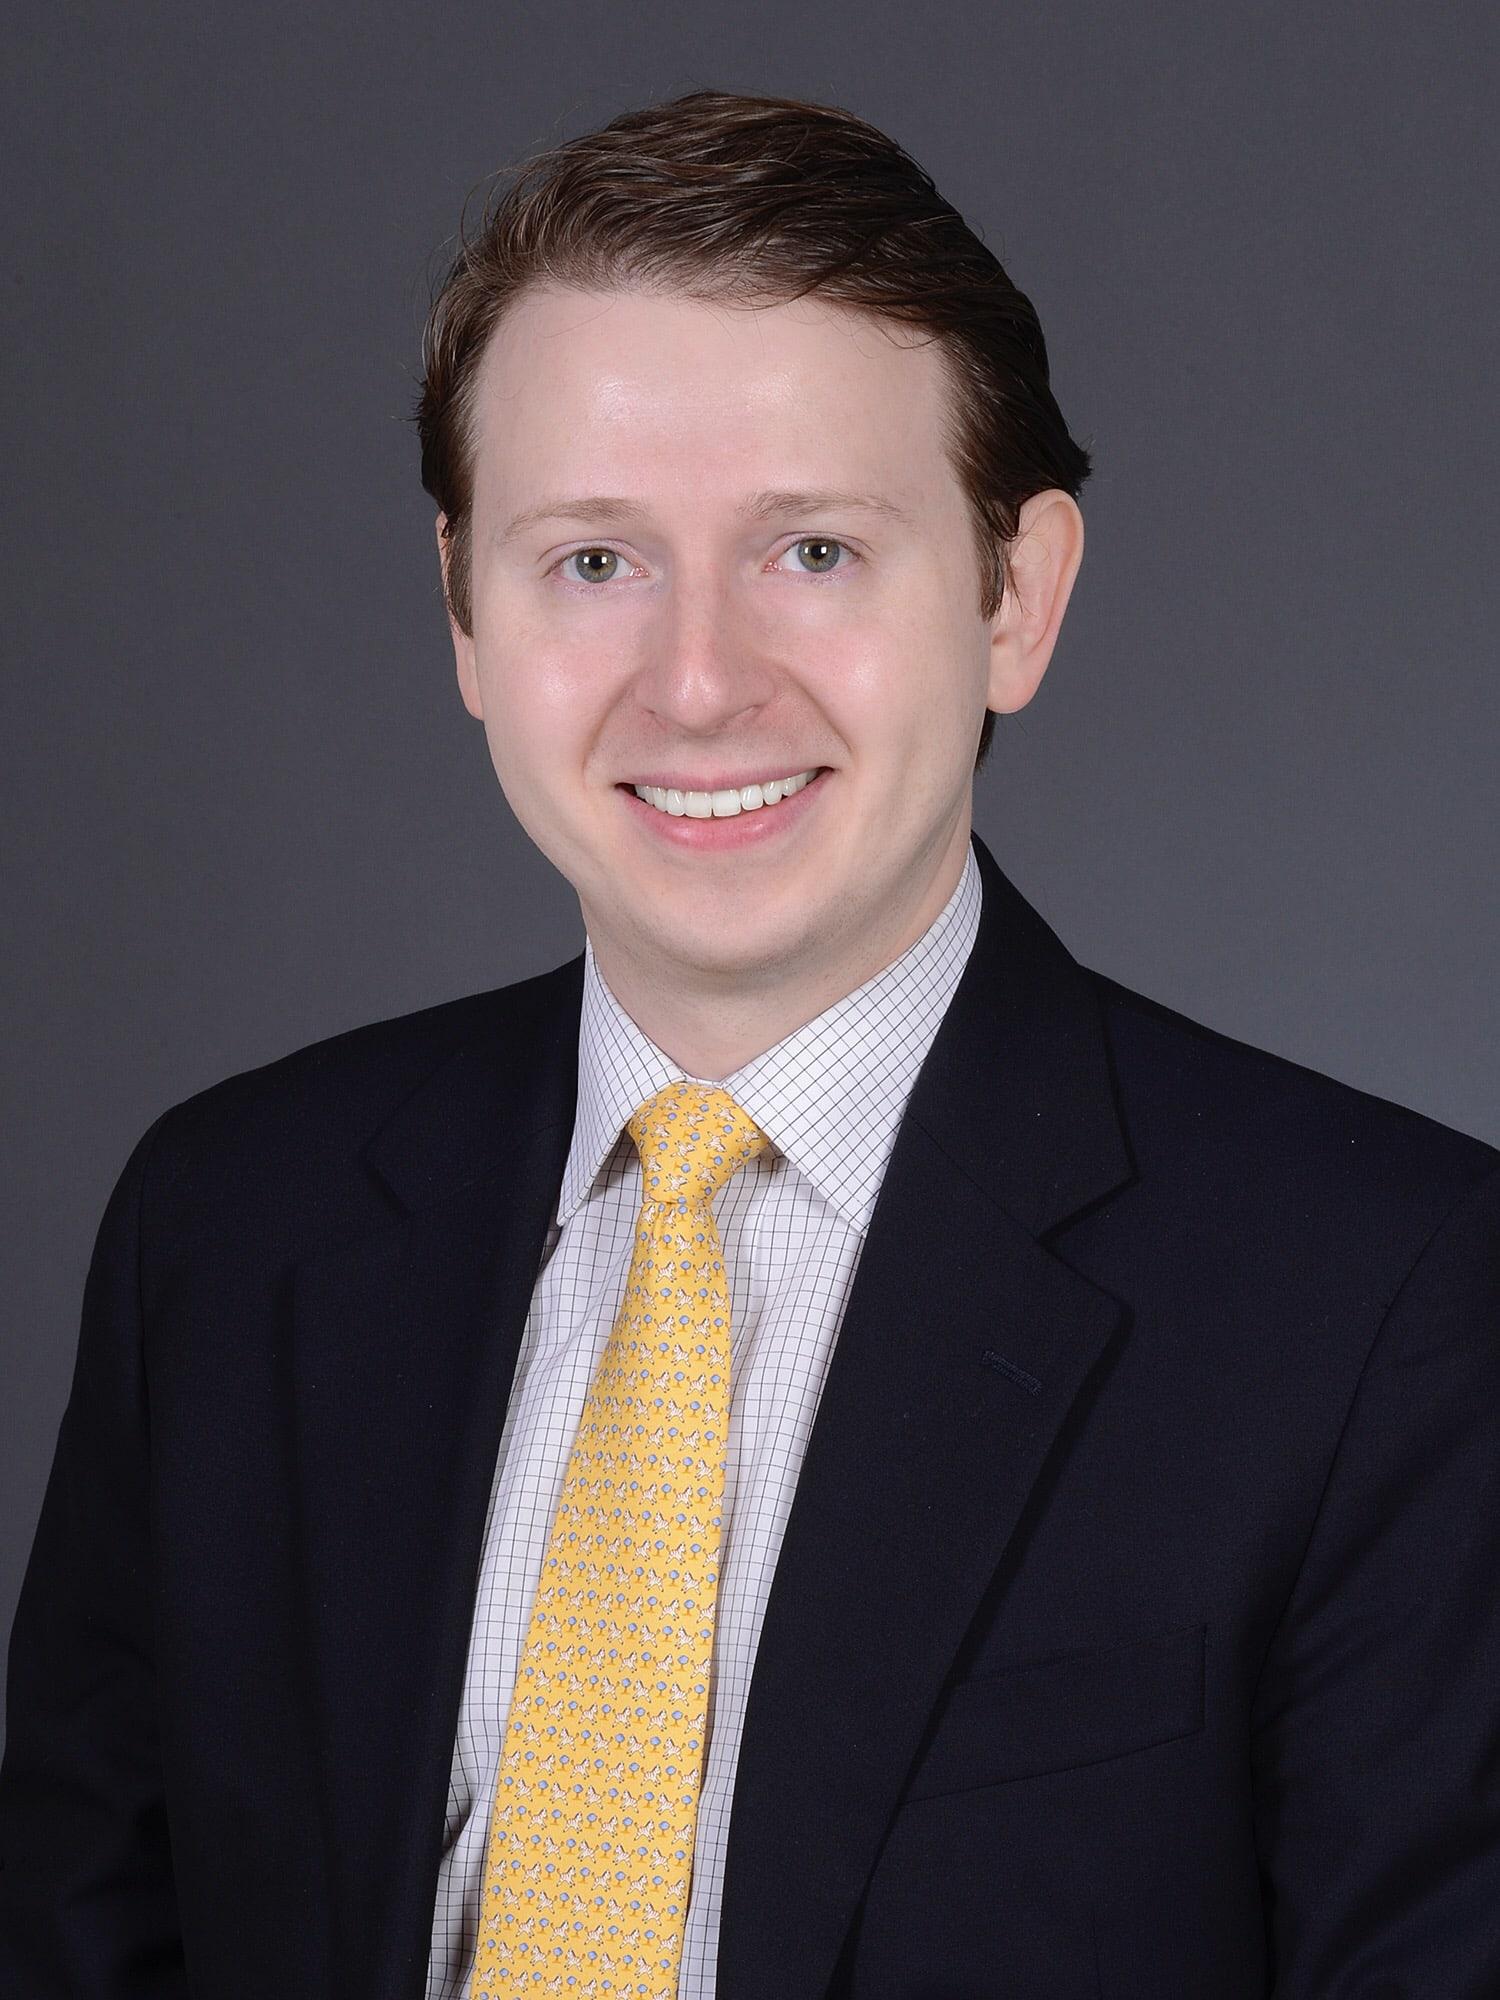 Michael Alperovich